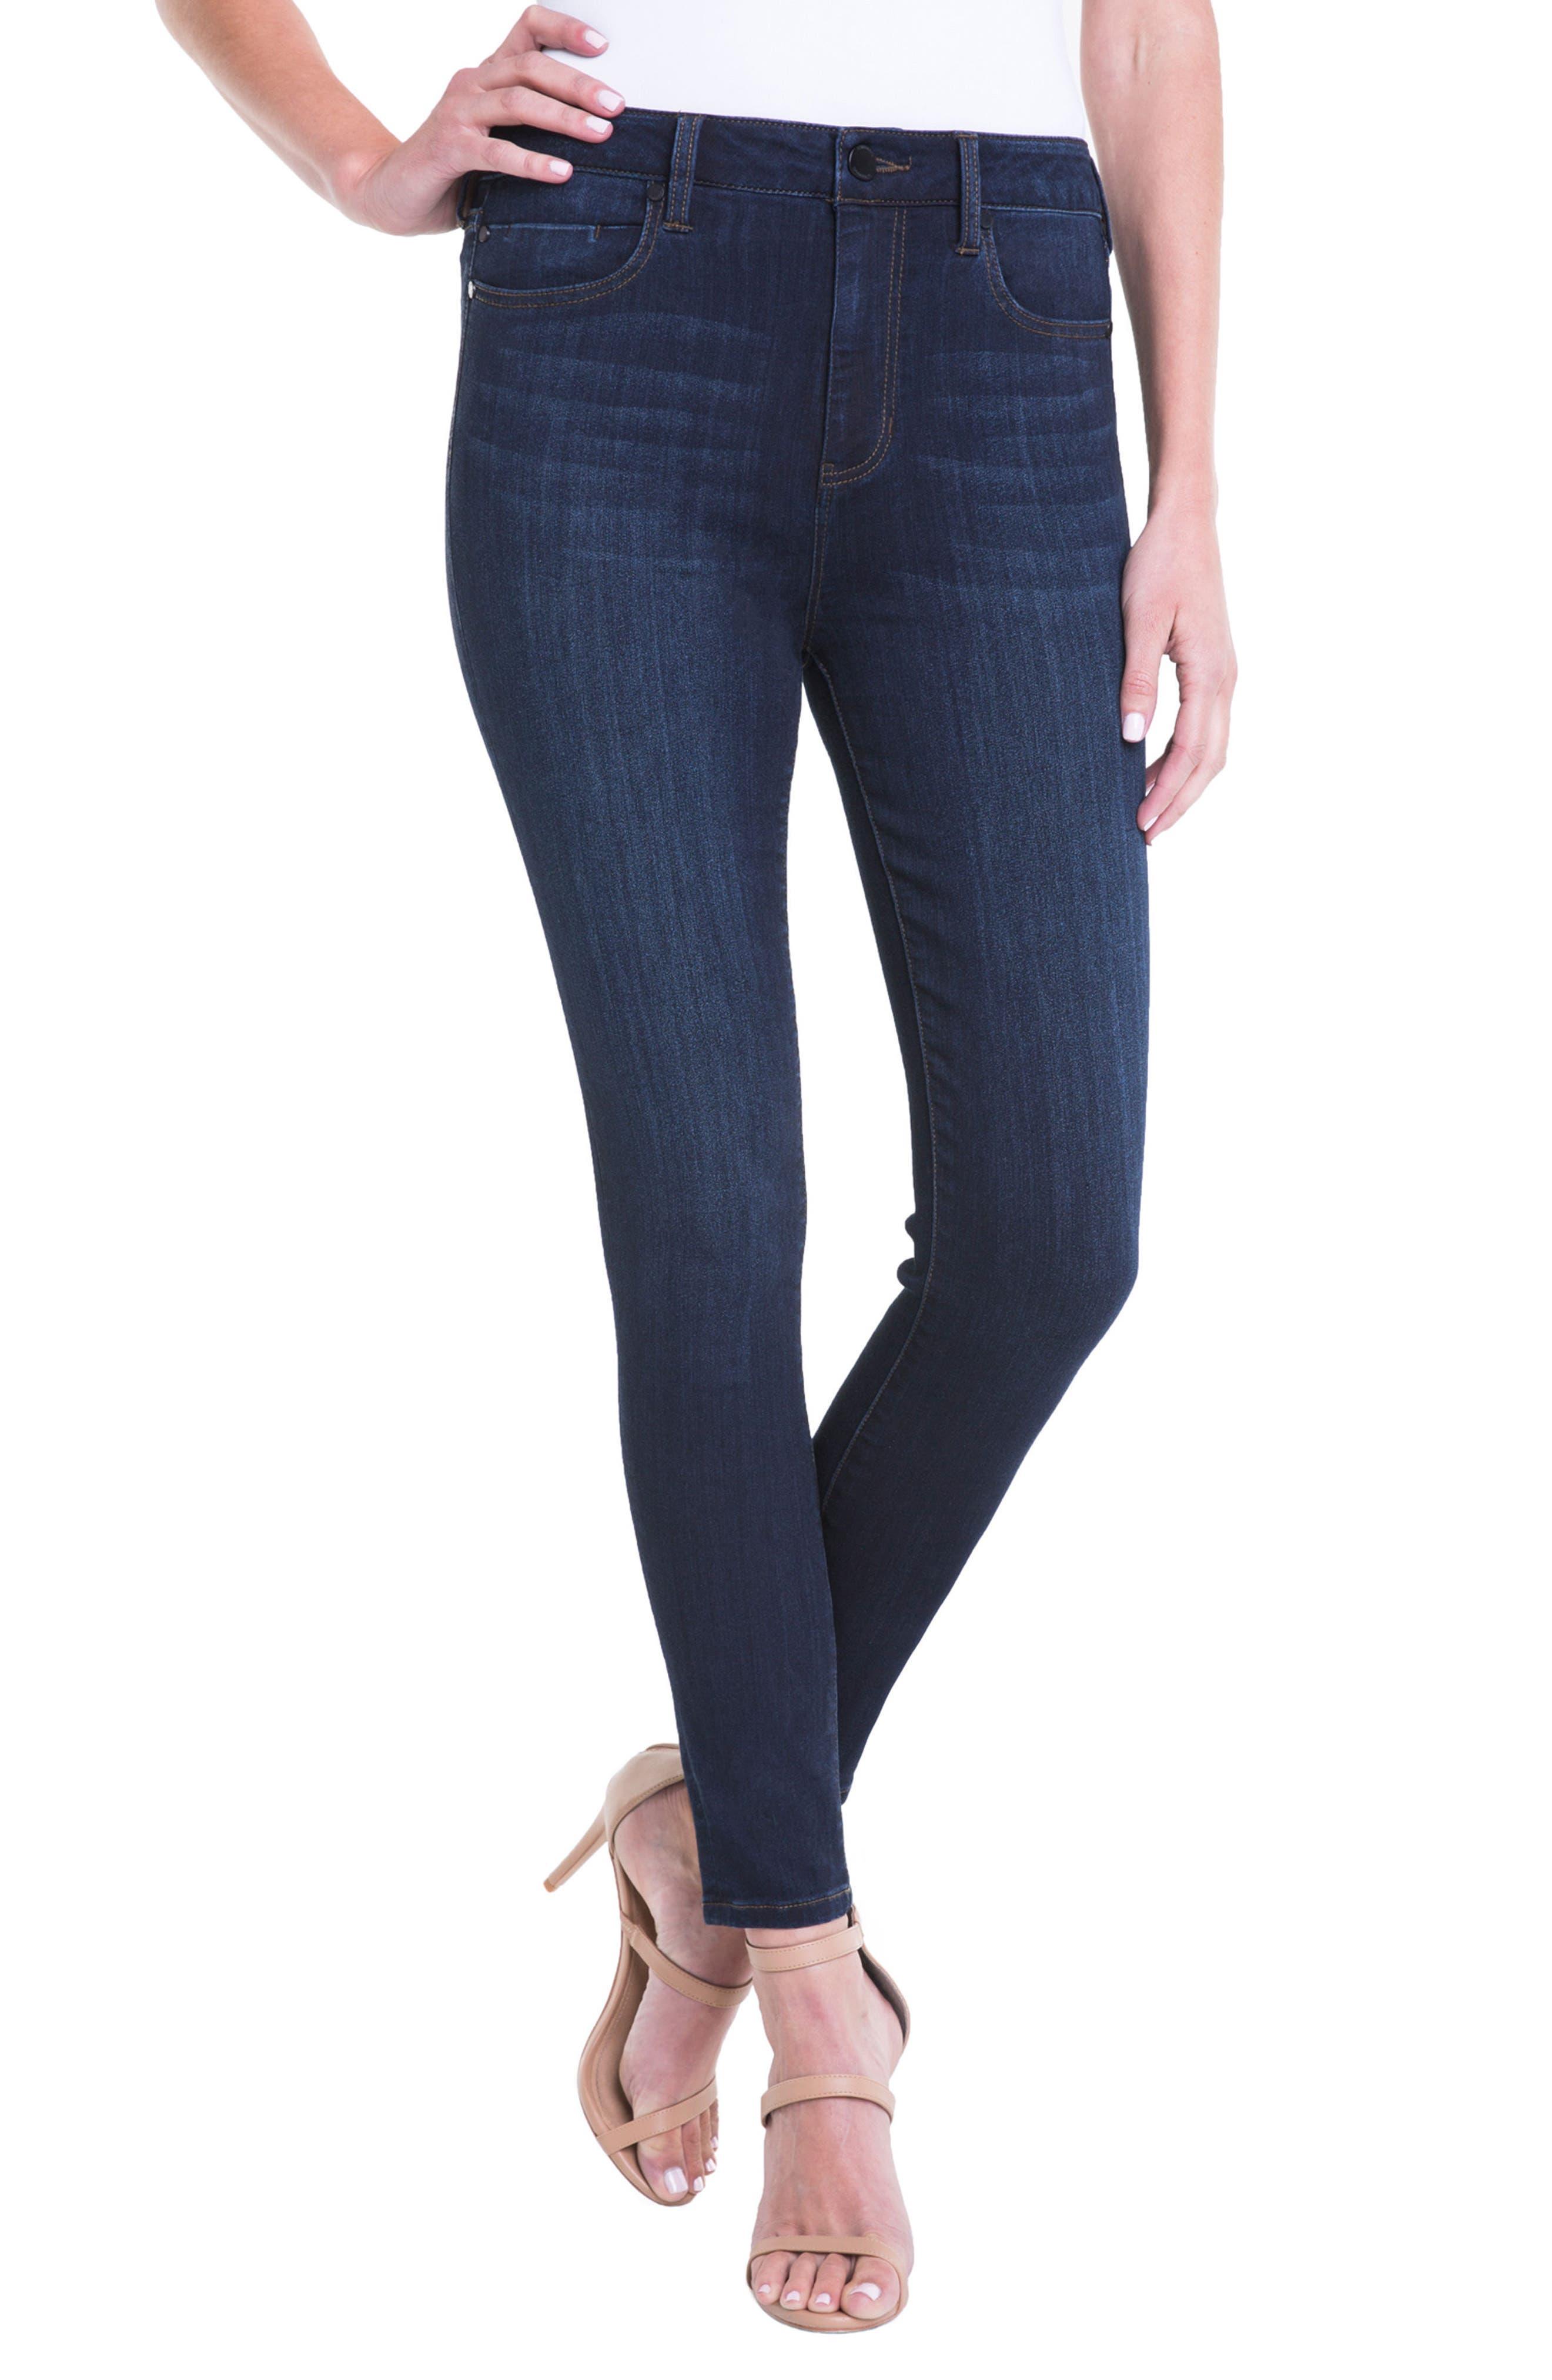 Jeans Company Bridget High Waist Skinny Jeans,                         Main,                         color, Dunmore Dark